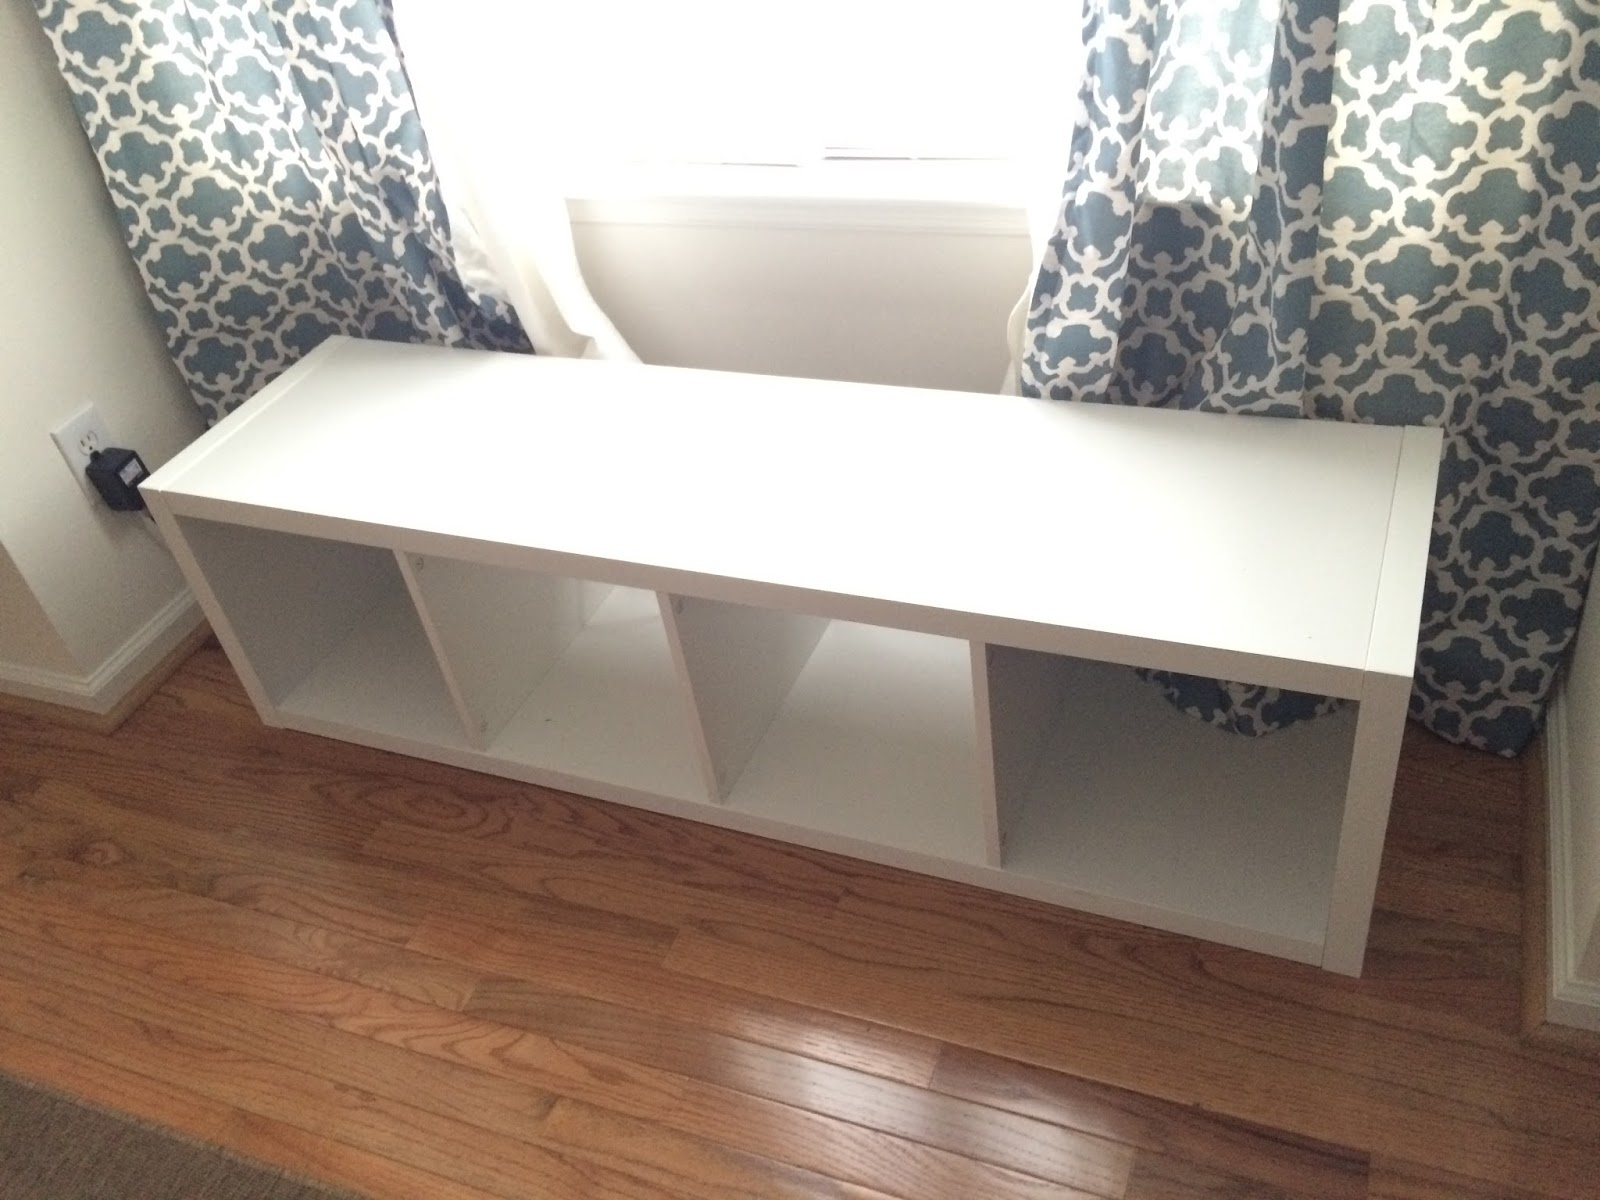 Diy Ikea Kallax Storage Bench